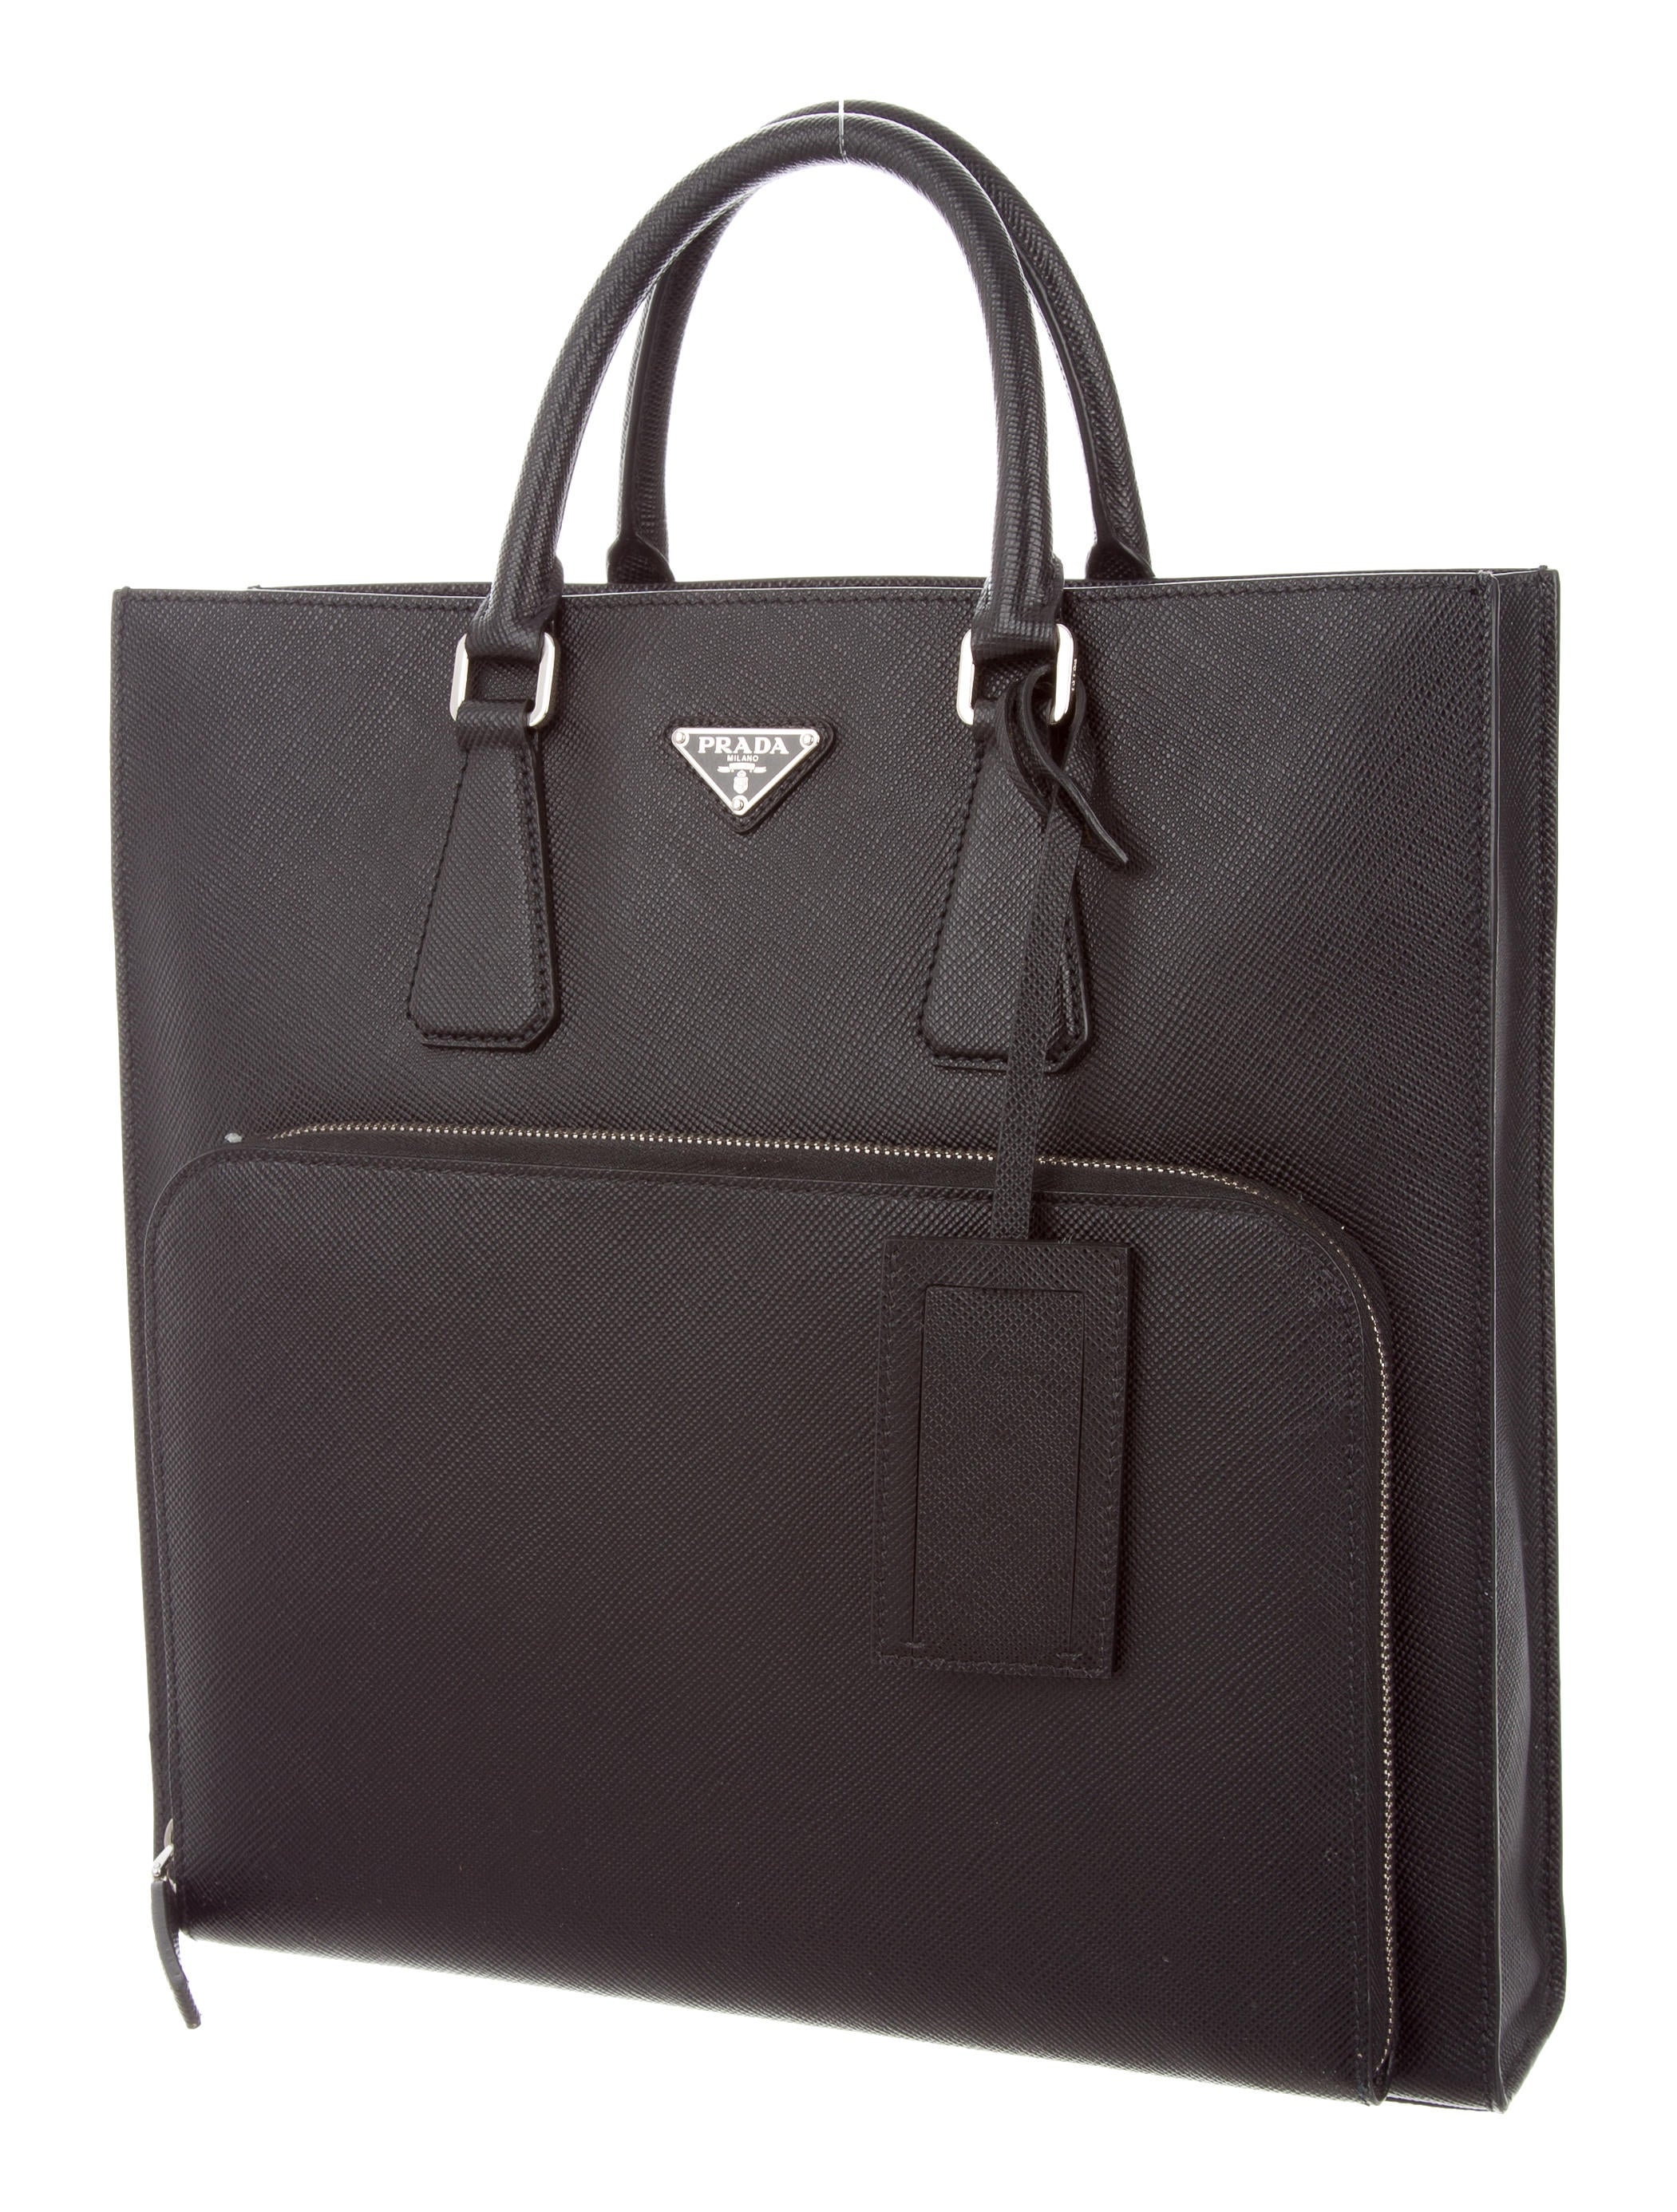 56ba84ad33c6 Prada Bags Saffiano Lux | Casper's & Runyon's Shamrocks | Nook